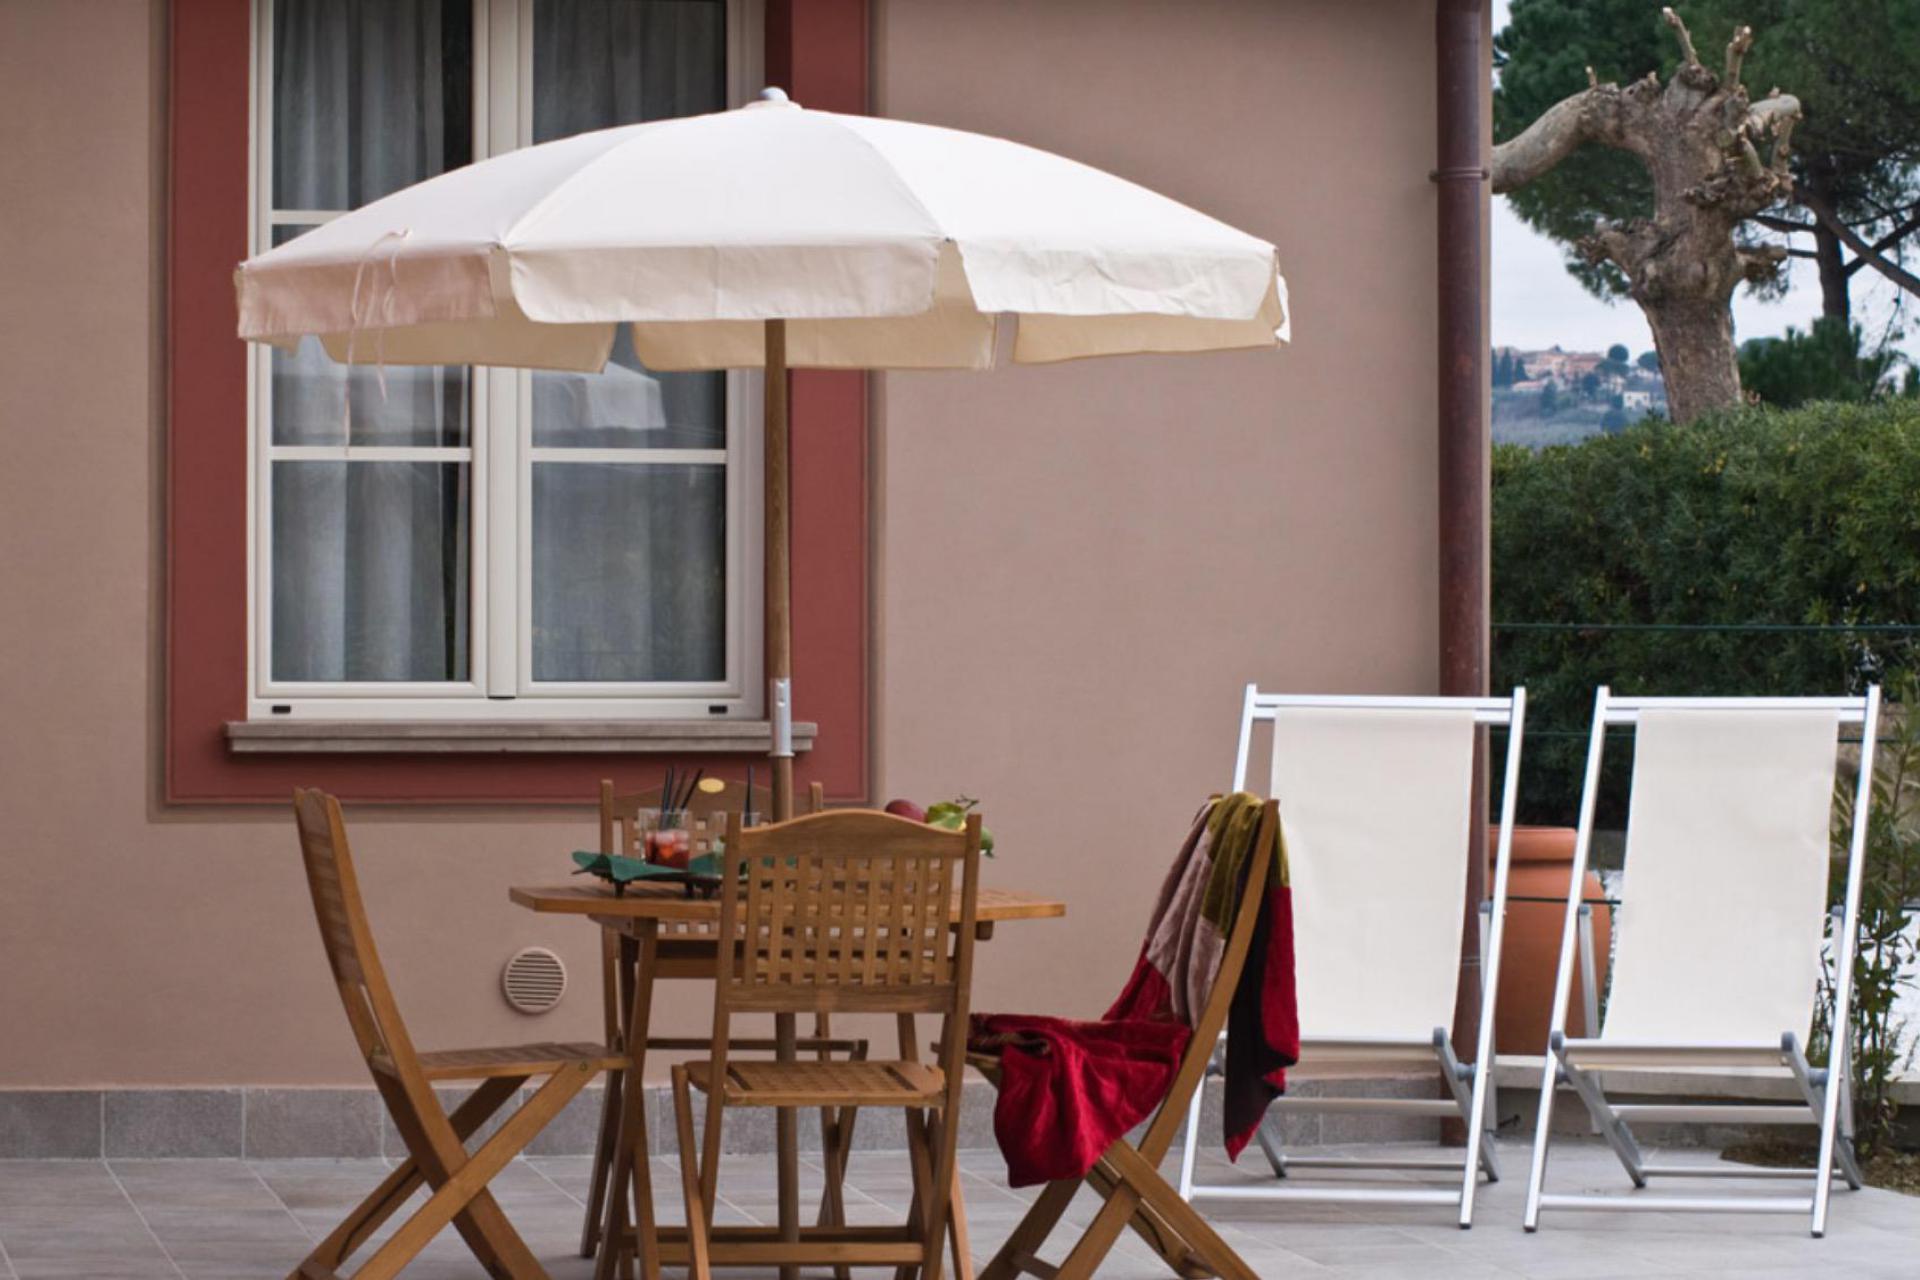 Agriturismo Toscana Agriturismo accogliente, appartamenti comodi in Toscana